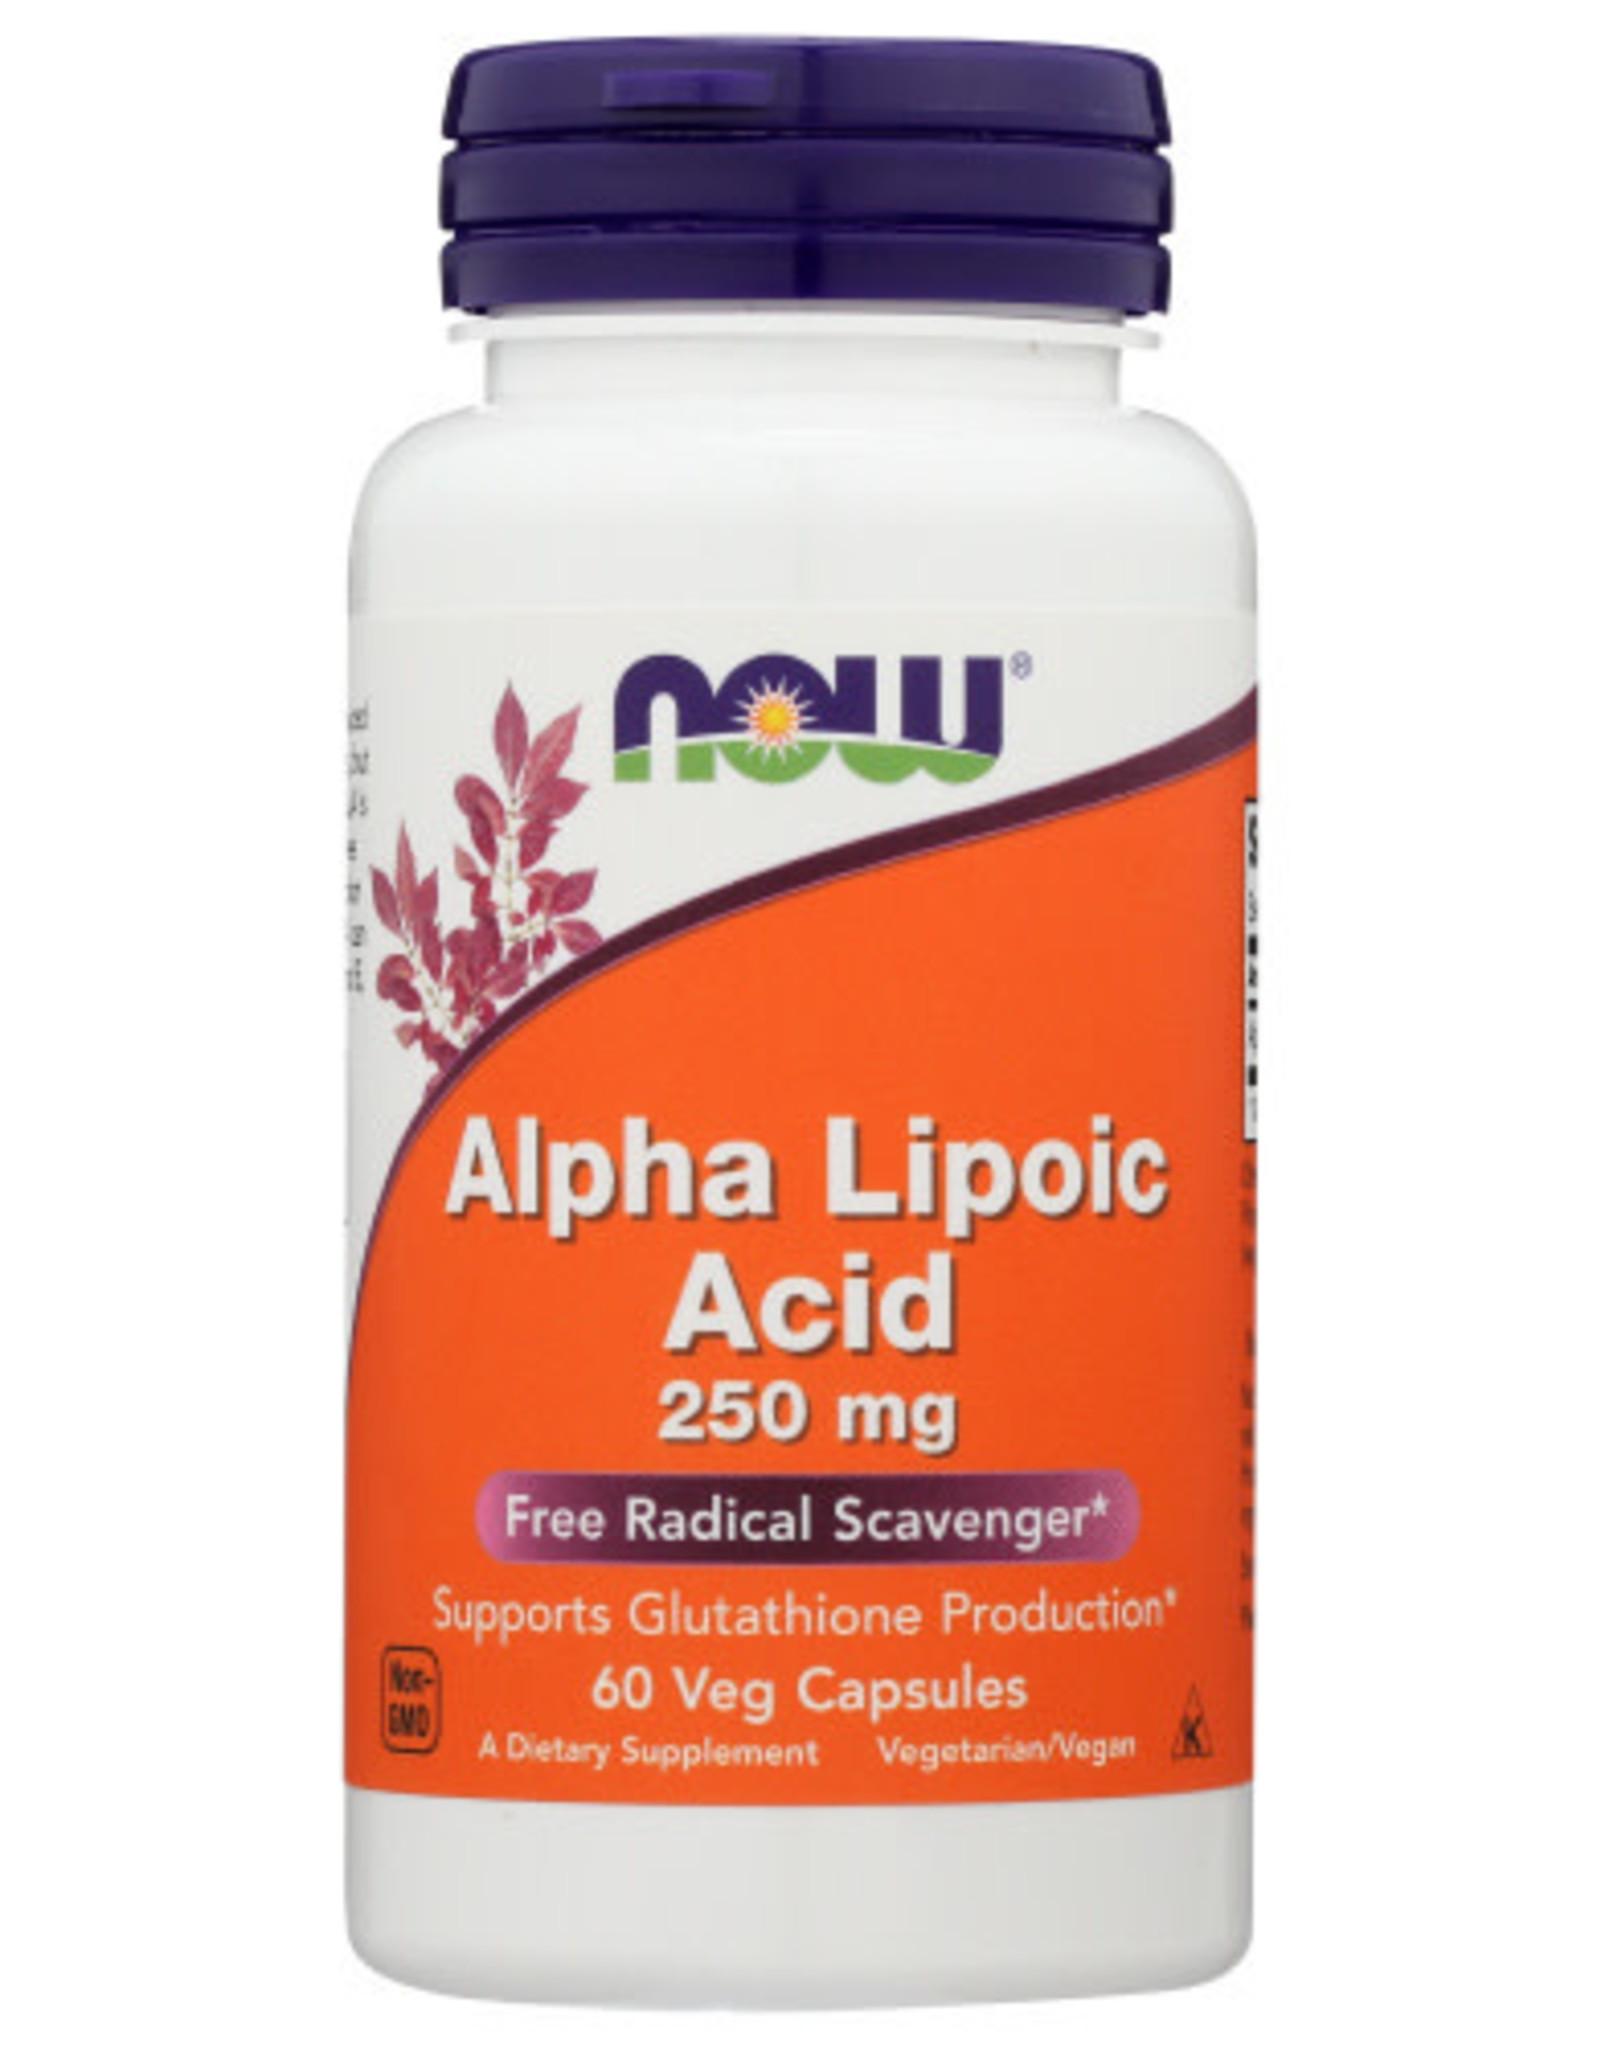 NOW® ALPHA LIPOIC ACID 250 MG, 60 CAPS.